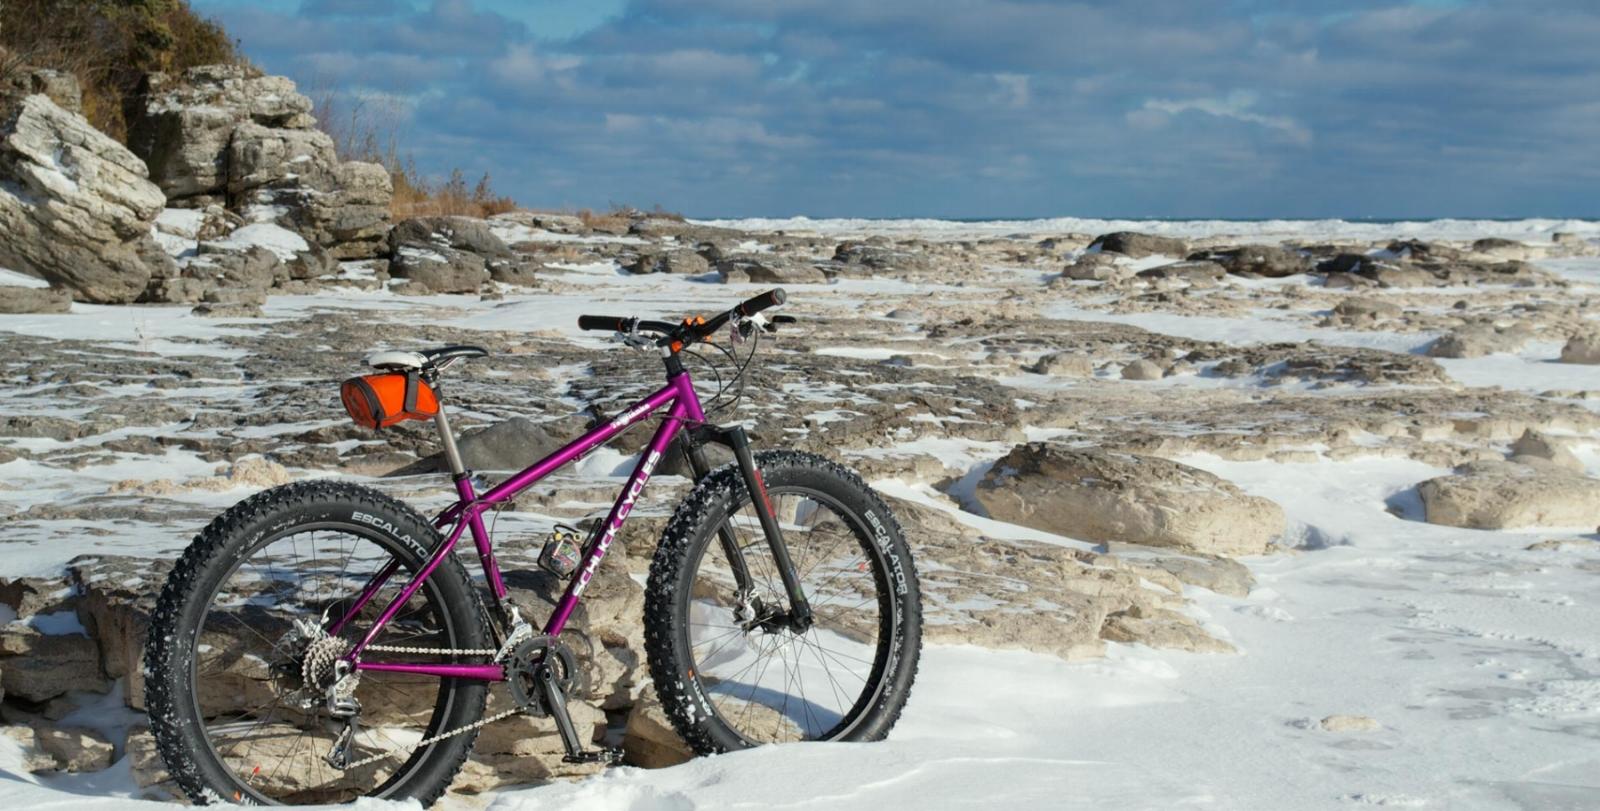 Photo credit: fat-bike.com